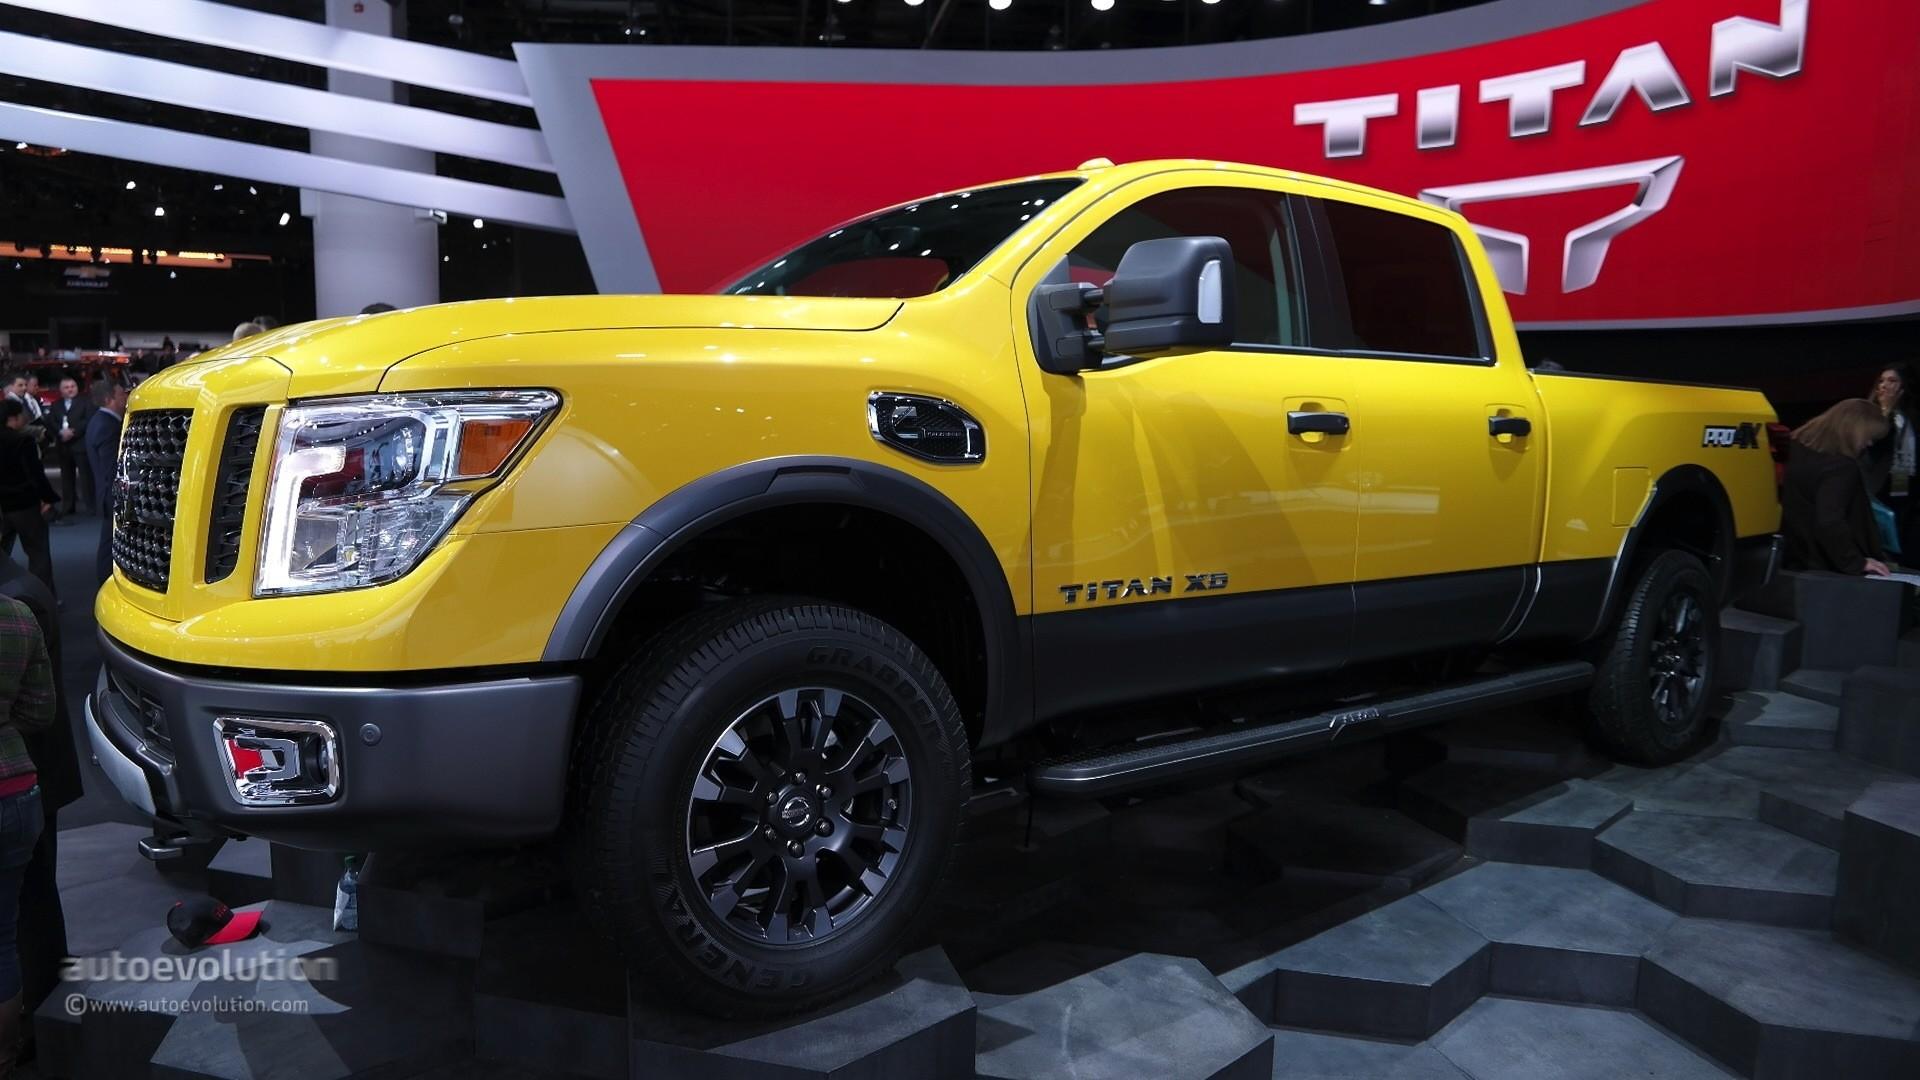 ... 2016 Nissan Titan XD Cummins Diesel Live Photo @ 2015 Detroit Auto Show  ...